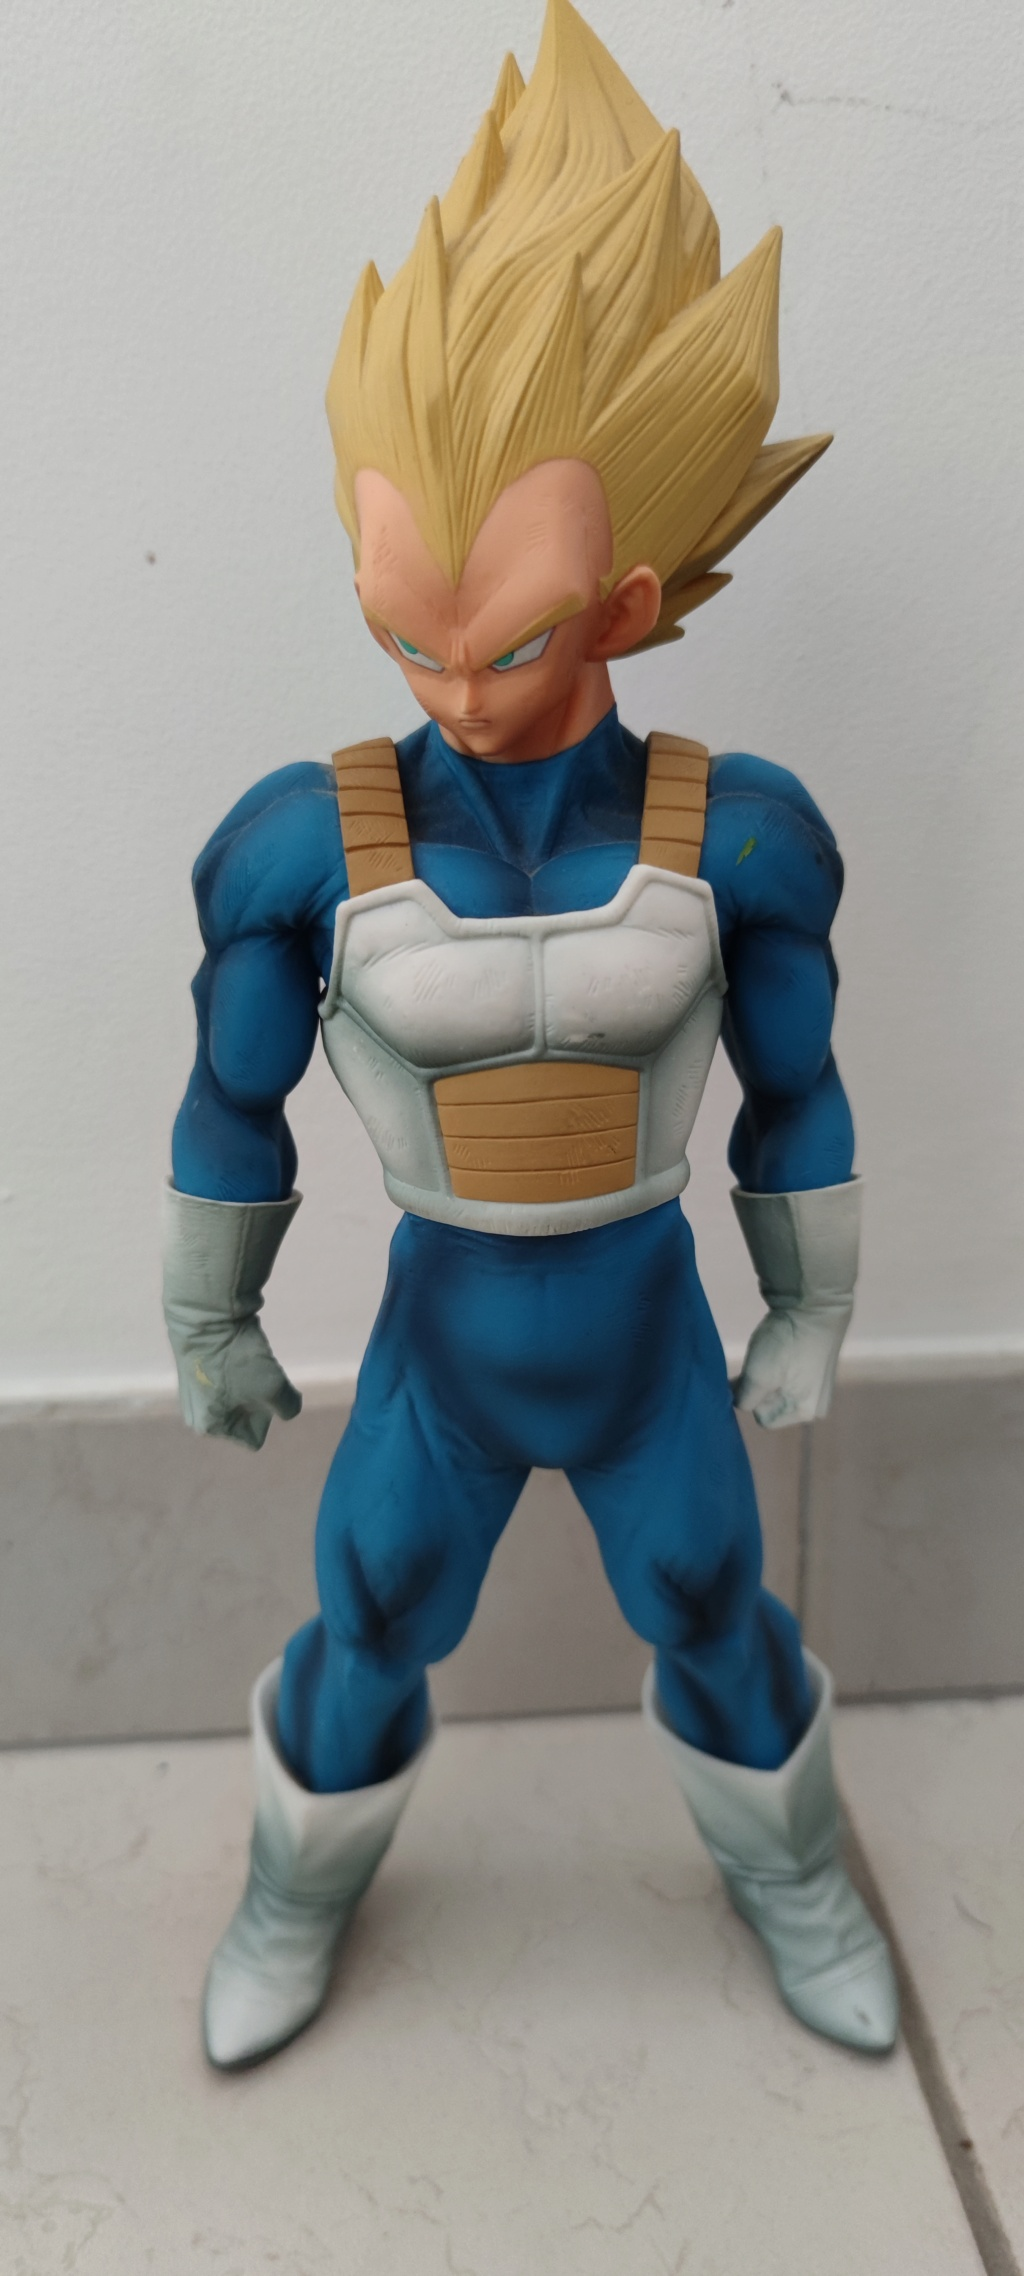 [VDS] Figurines Dragon Ball, One piece, Naruto, Megaman etc....  16162428